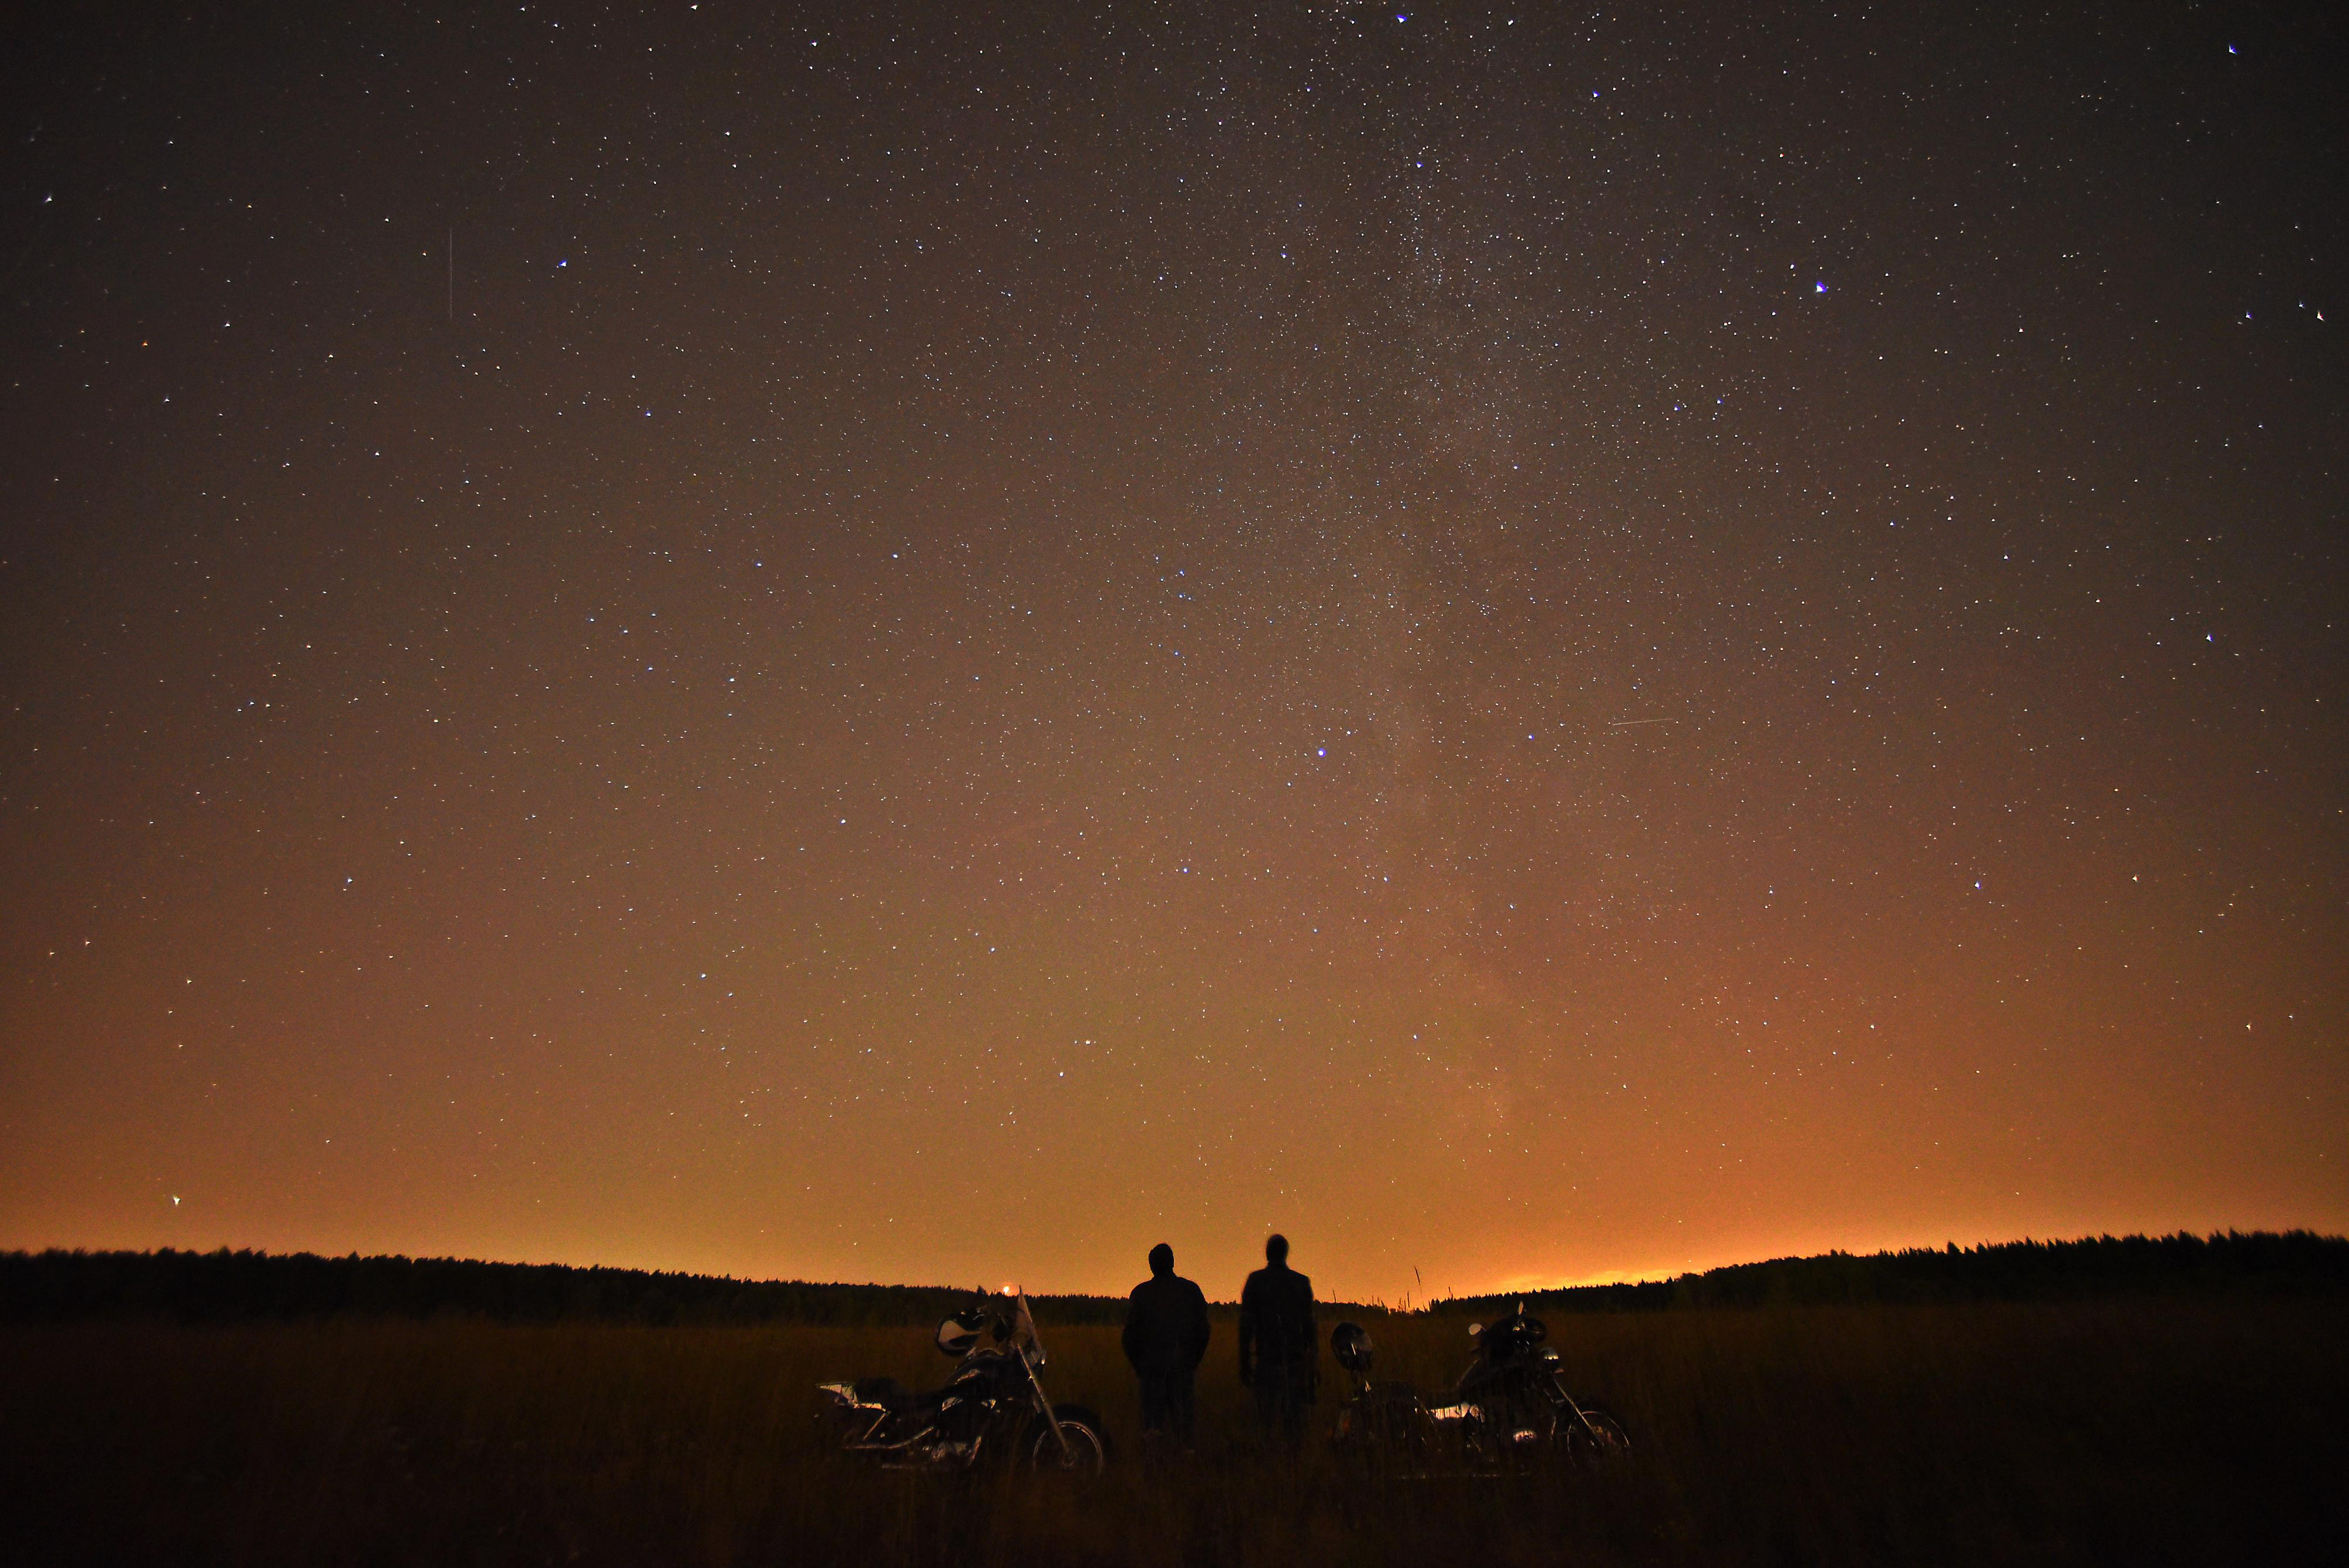 Сентябрь начался с бабьего лета. Фото: Александр Кожохин